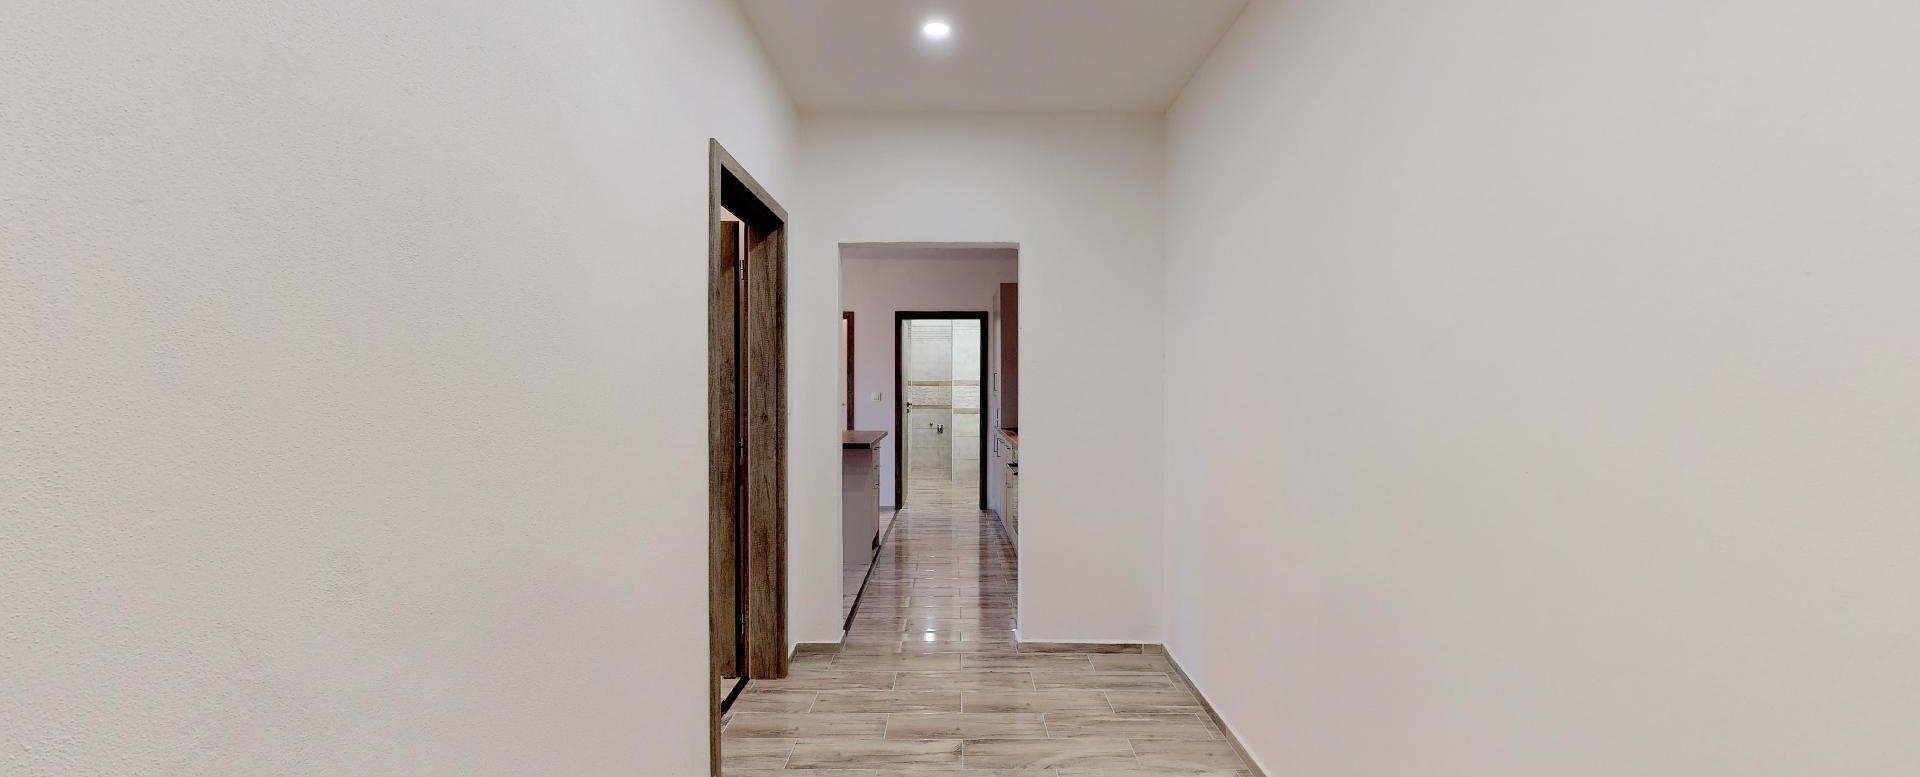 Vstup do bytu